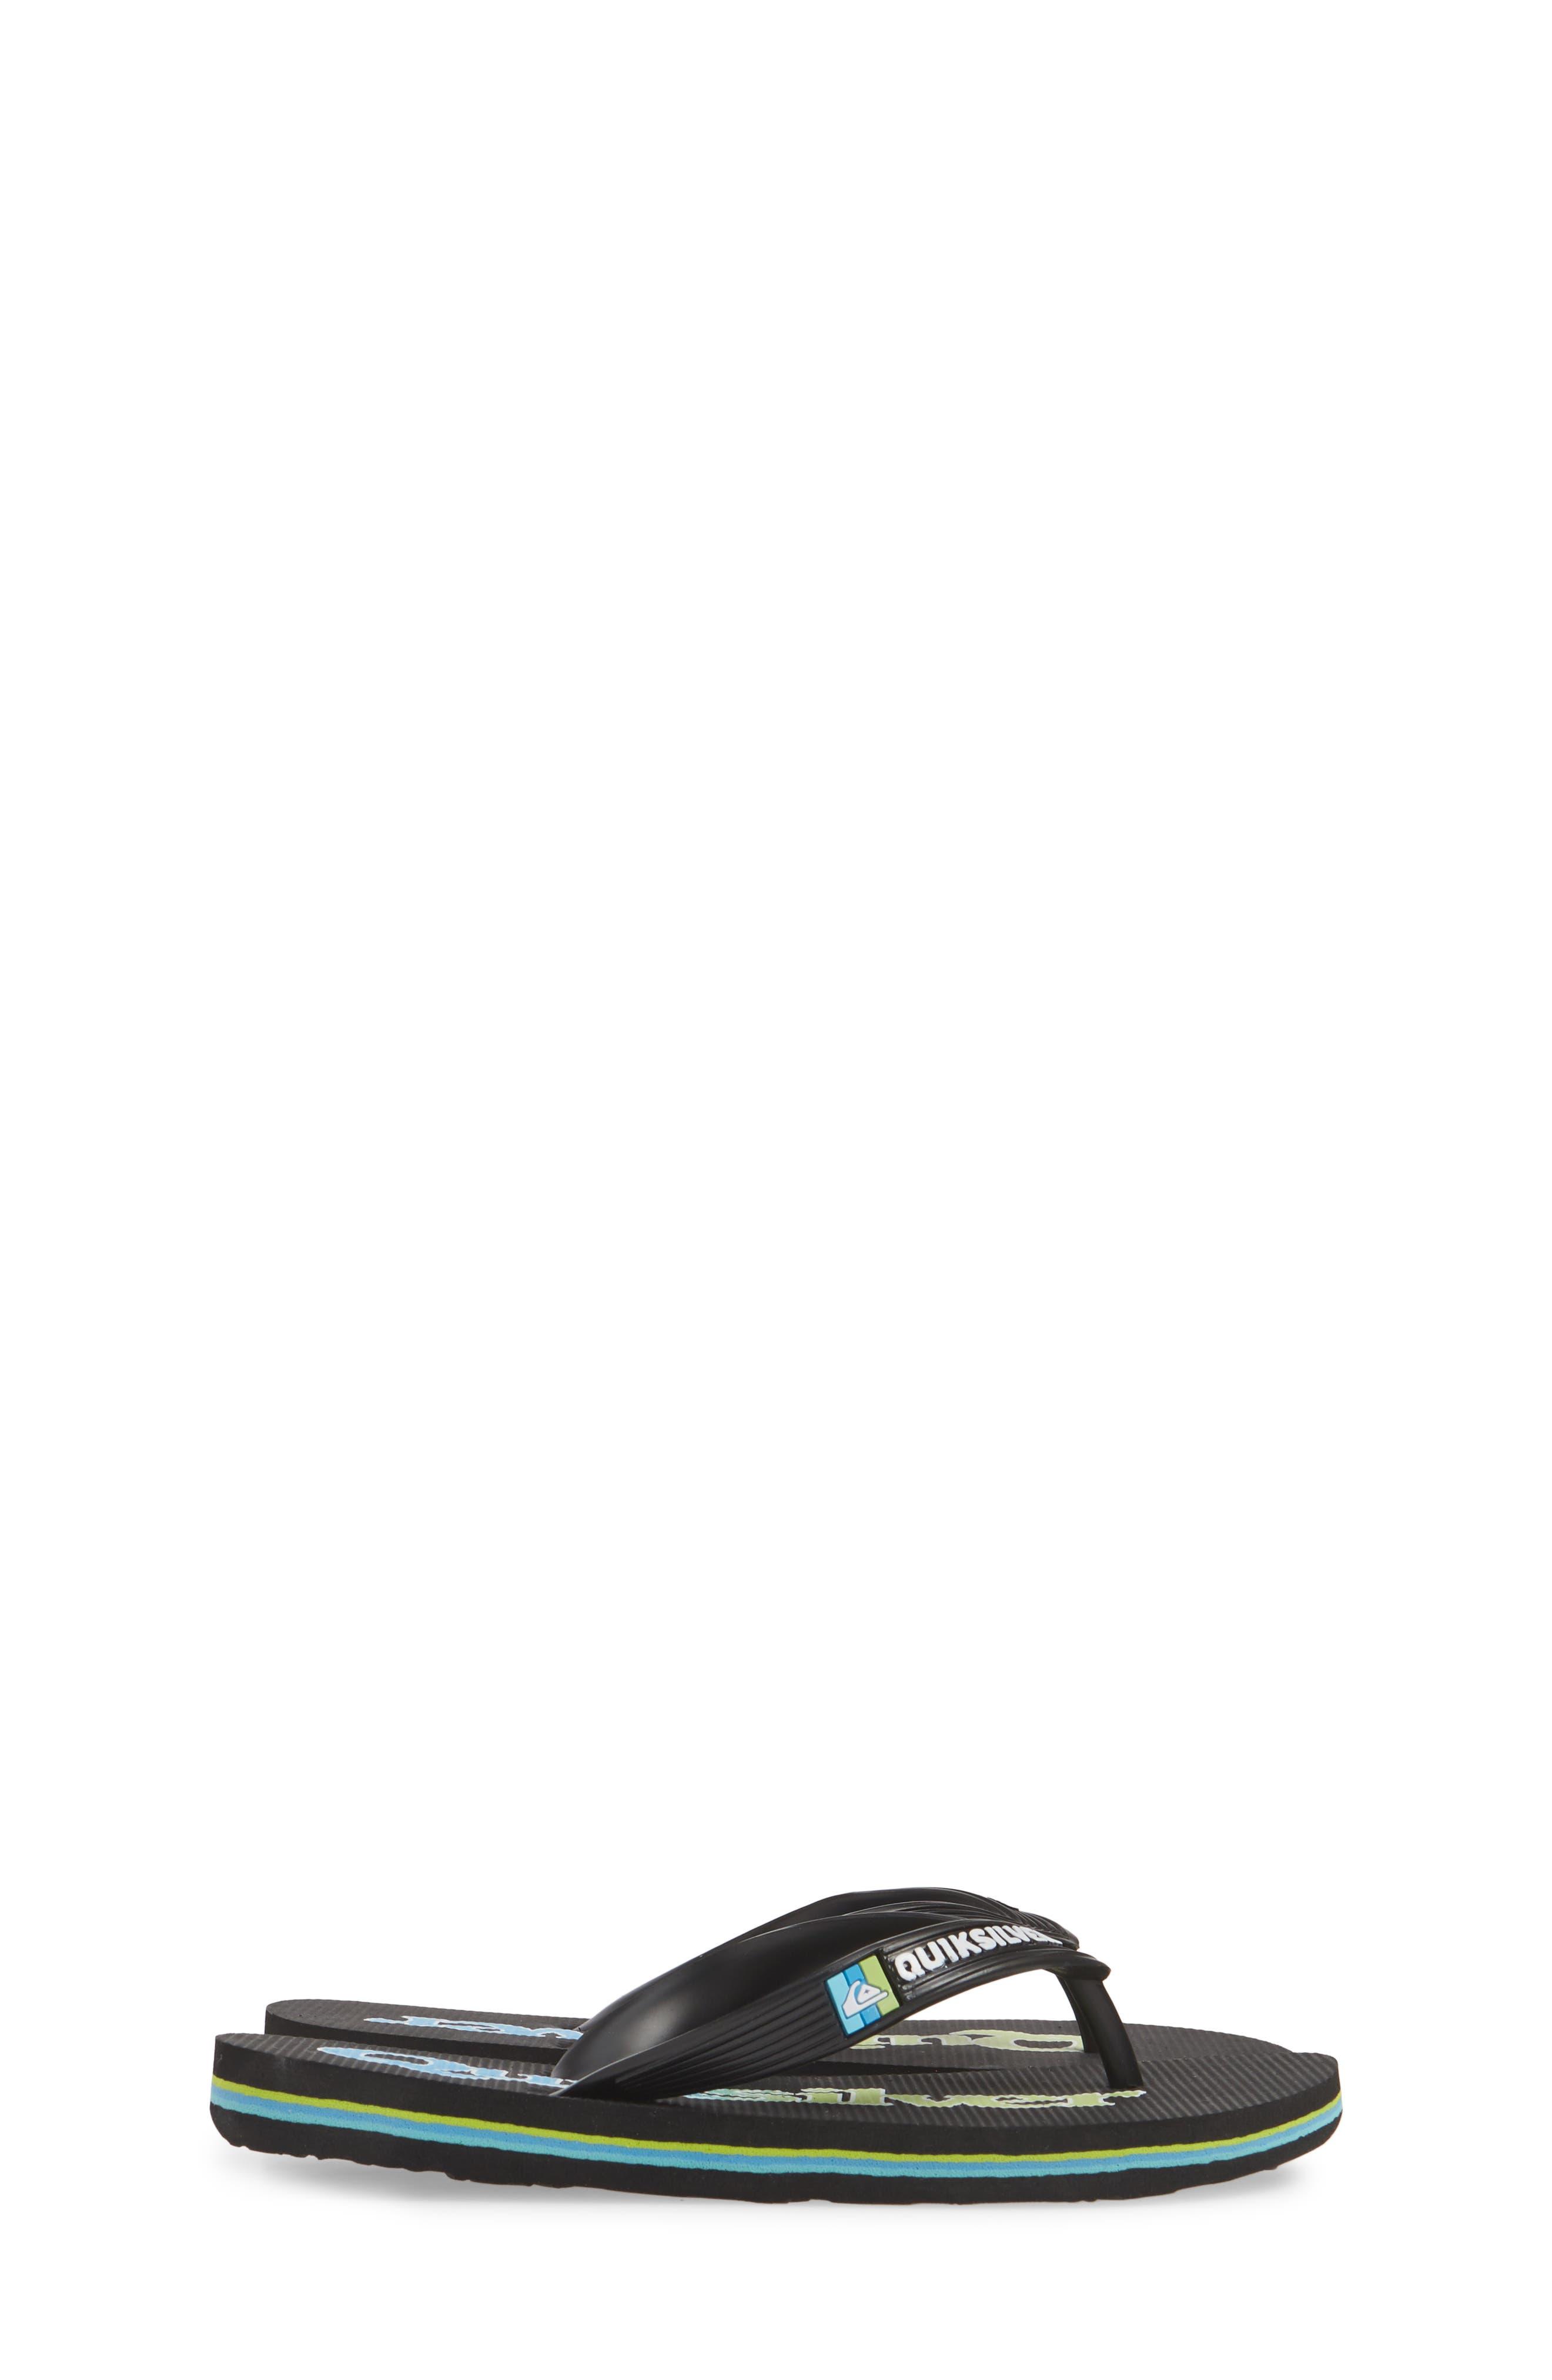 QUIKSILVER, Molokai Wordmark Flip Flop, Alternate thumbnail 4, color, BLACK/ GREEN/ BLUE